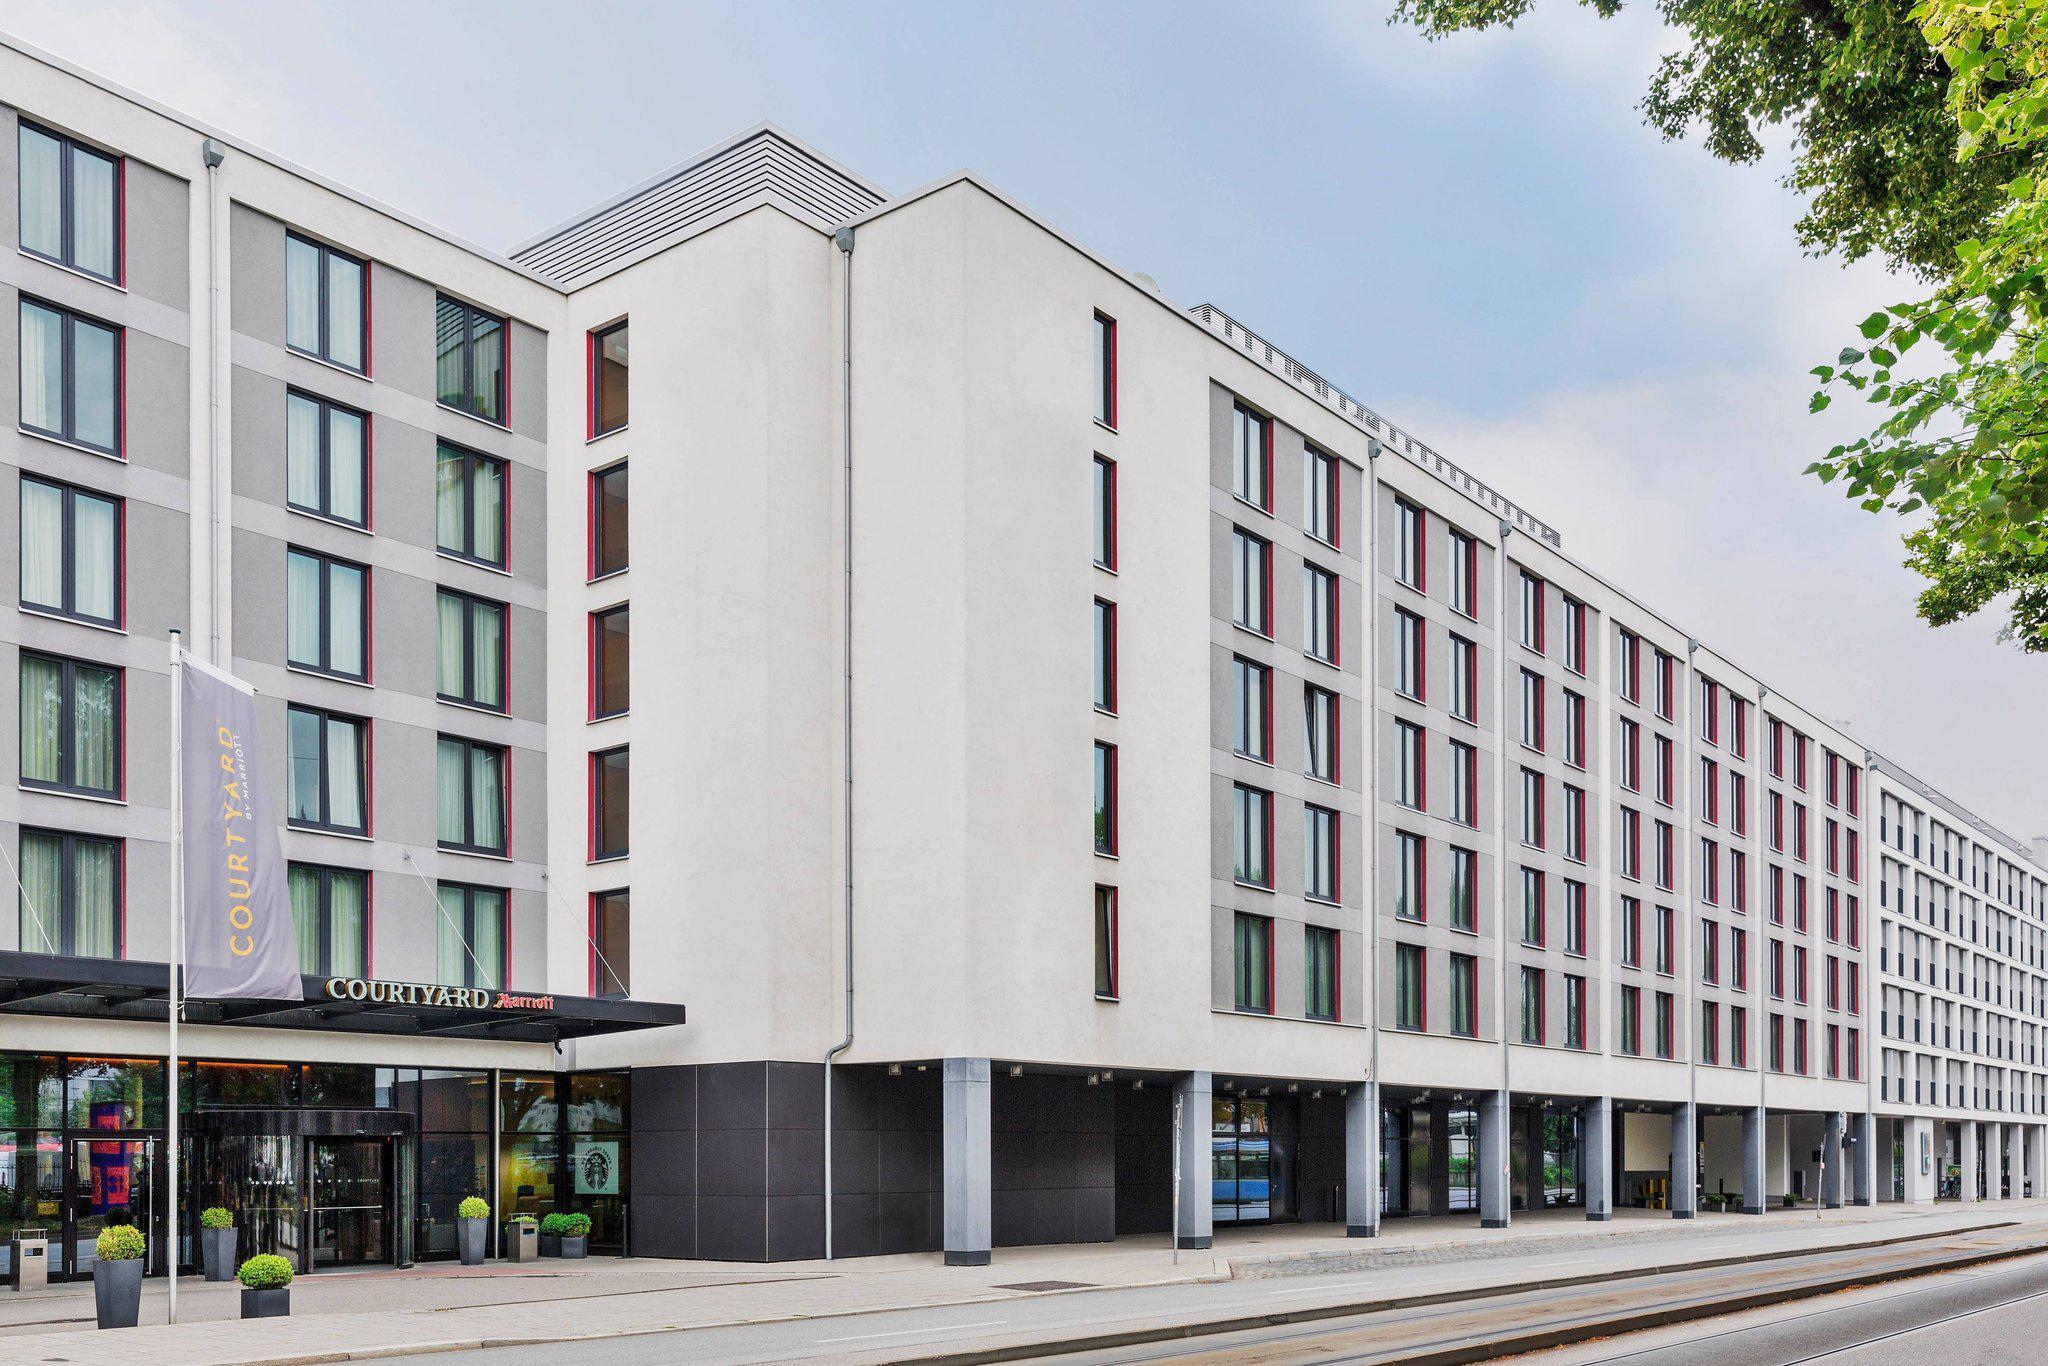 Courtyard by Marriott Munich City East